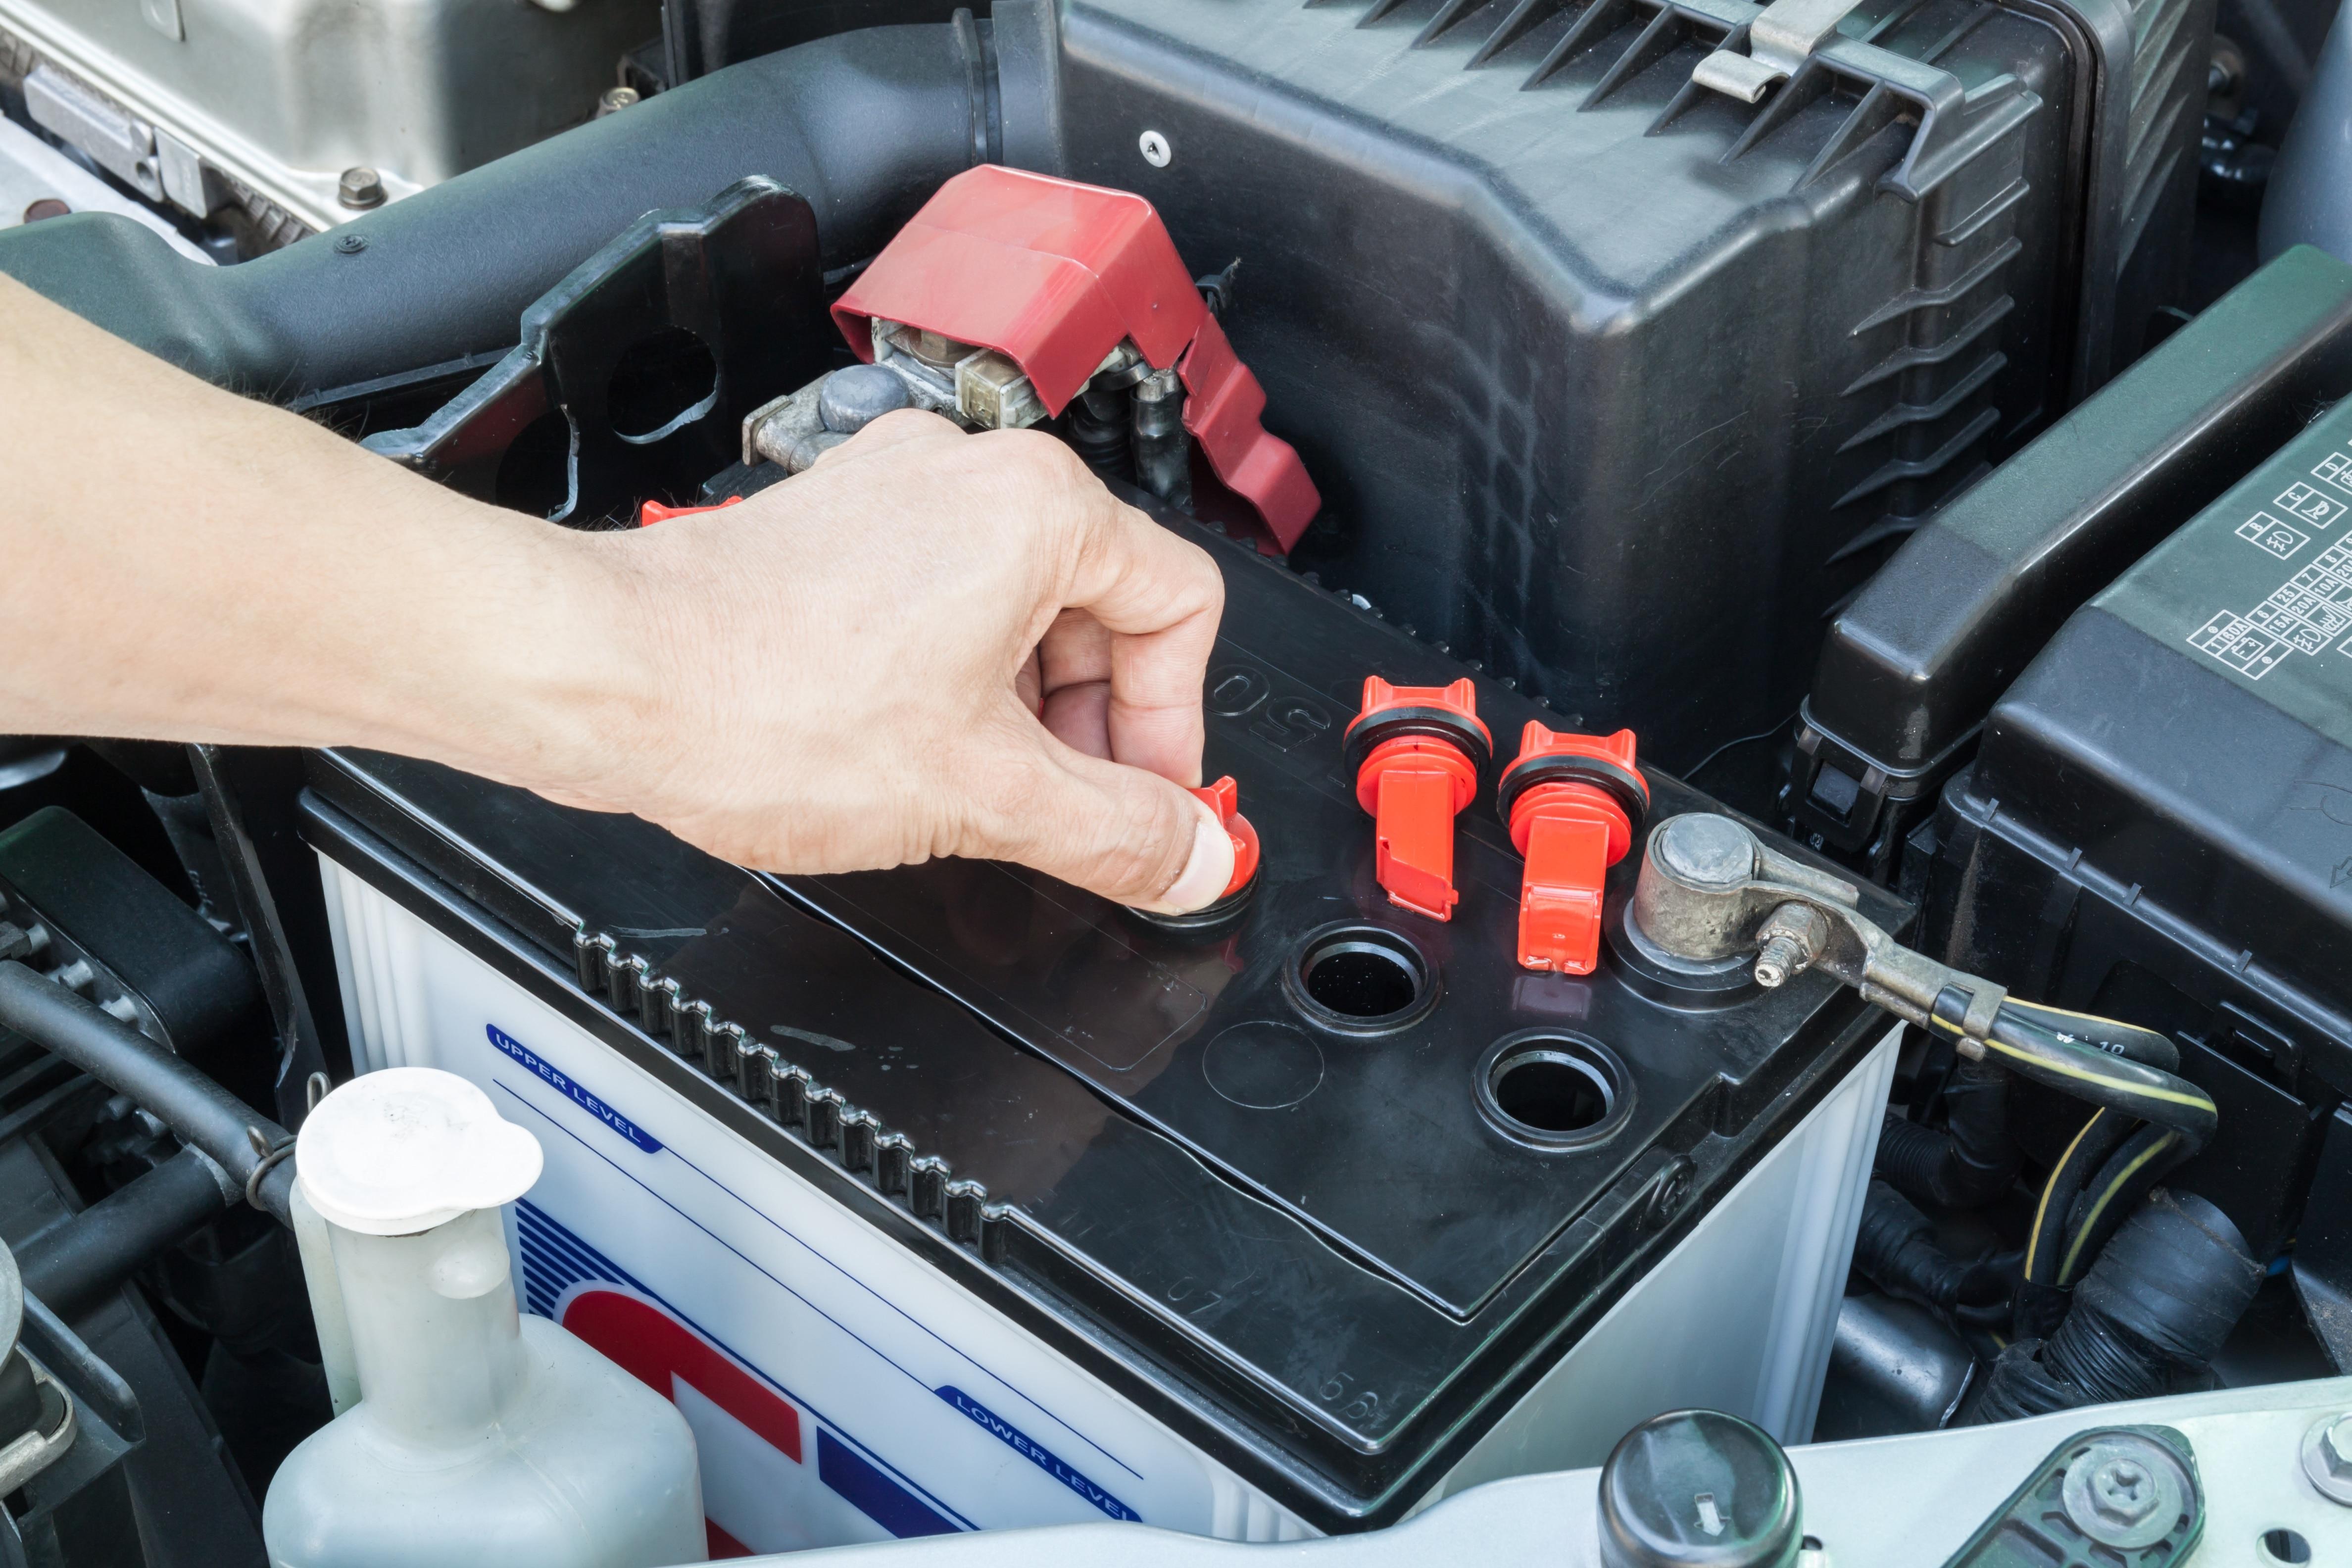 shutterstock 246178906 - Car Parts & Accessories